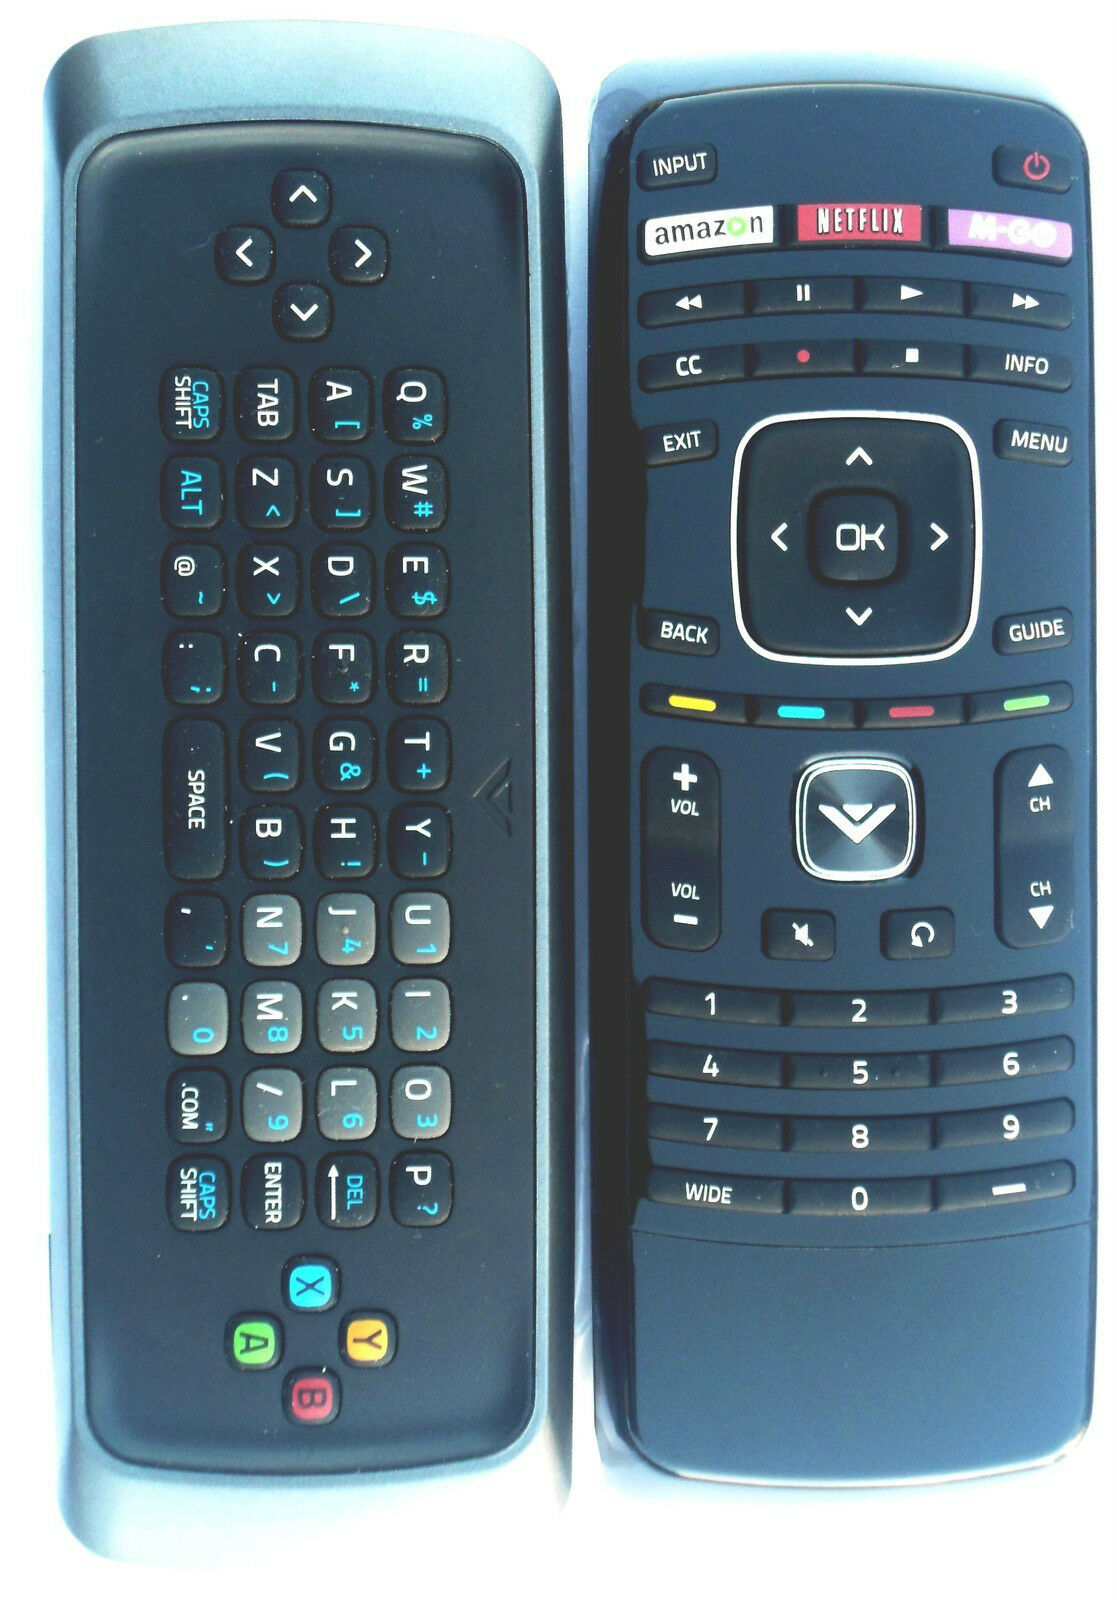 VIZIO Smart TV Keyboard remote for E650iA2 e601i-a3 & e701i-